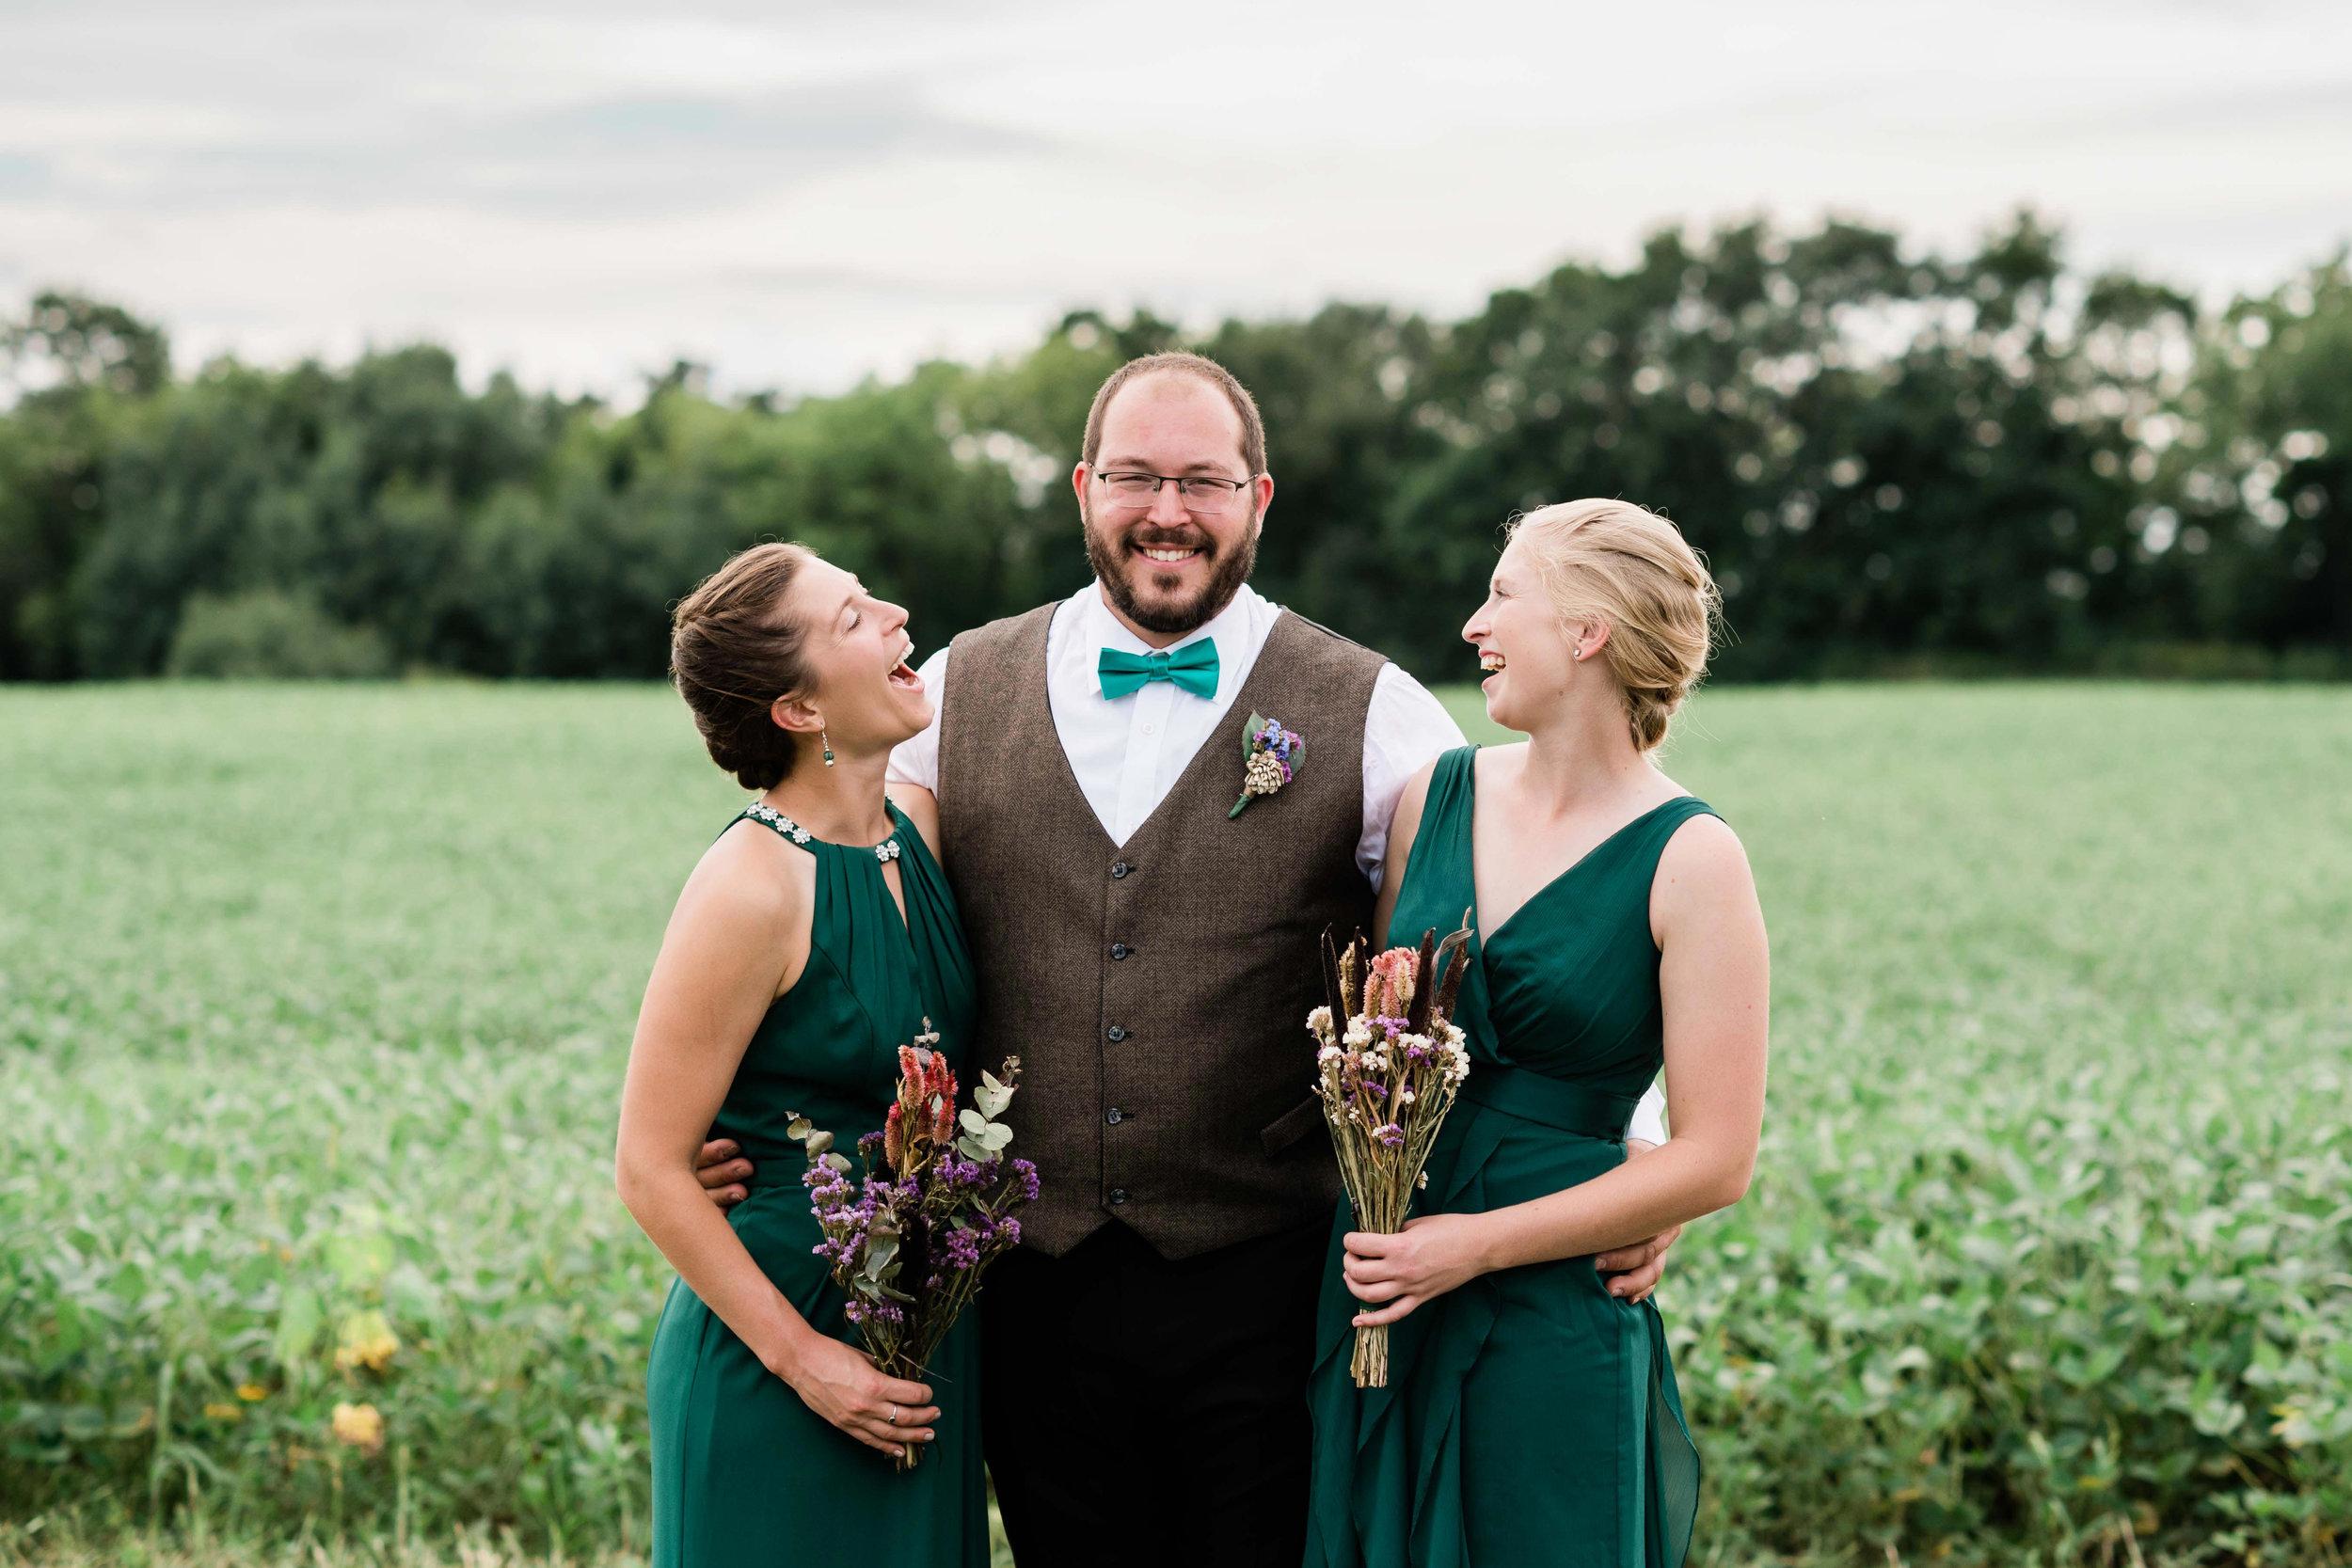 Bridesmaids admiring groom